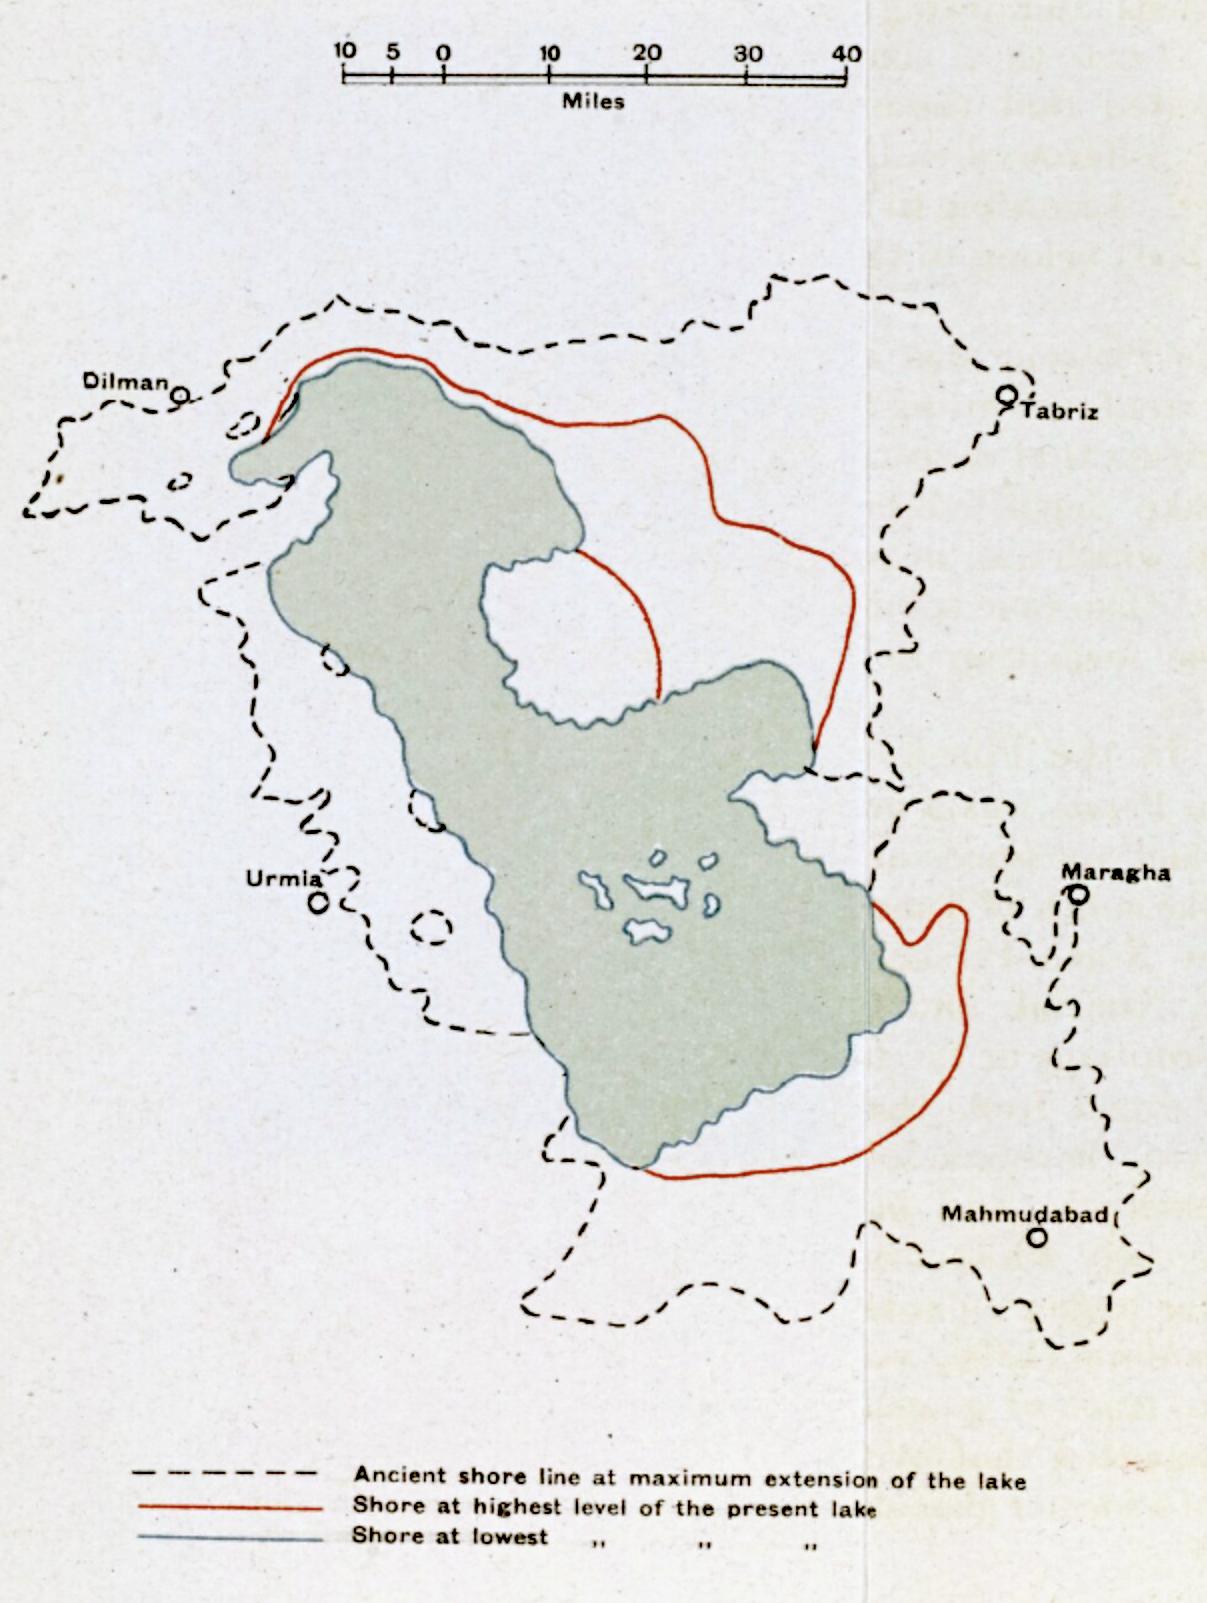 Ei britisk geologisk oversikt viser Urmia-sjøen sine dimensjonar slik ein trudde den var i mai 1918 ('Fig. 6 The Former Extension of Lake Urmia (after de Morgan)'  IOR/L/MIL/17/15/54, p 46A )